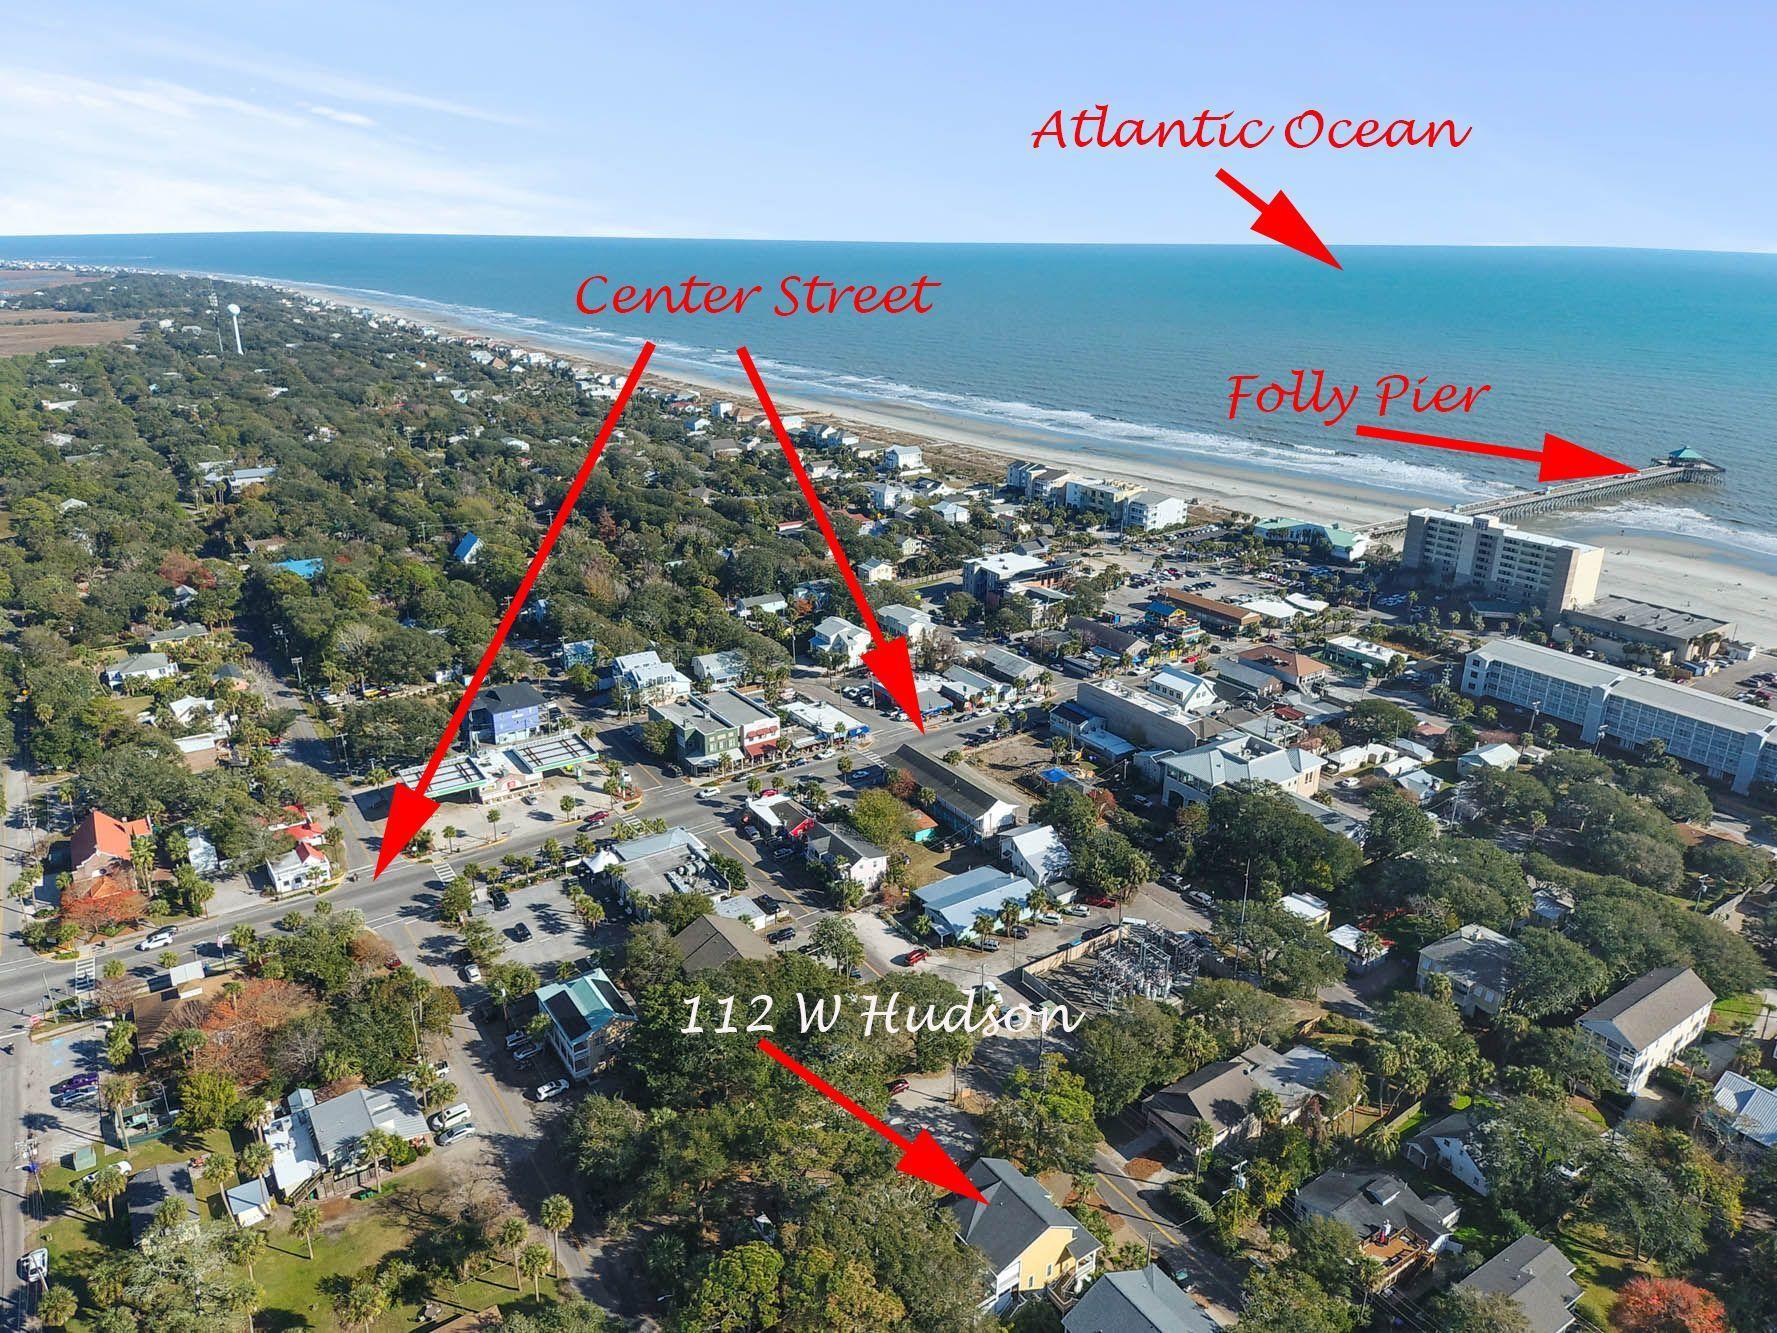 112 W Hudson Avenue Folly Beach, SC 29439